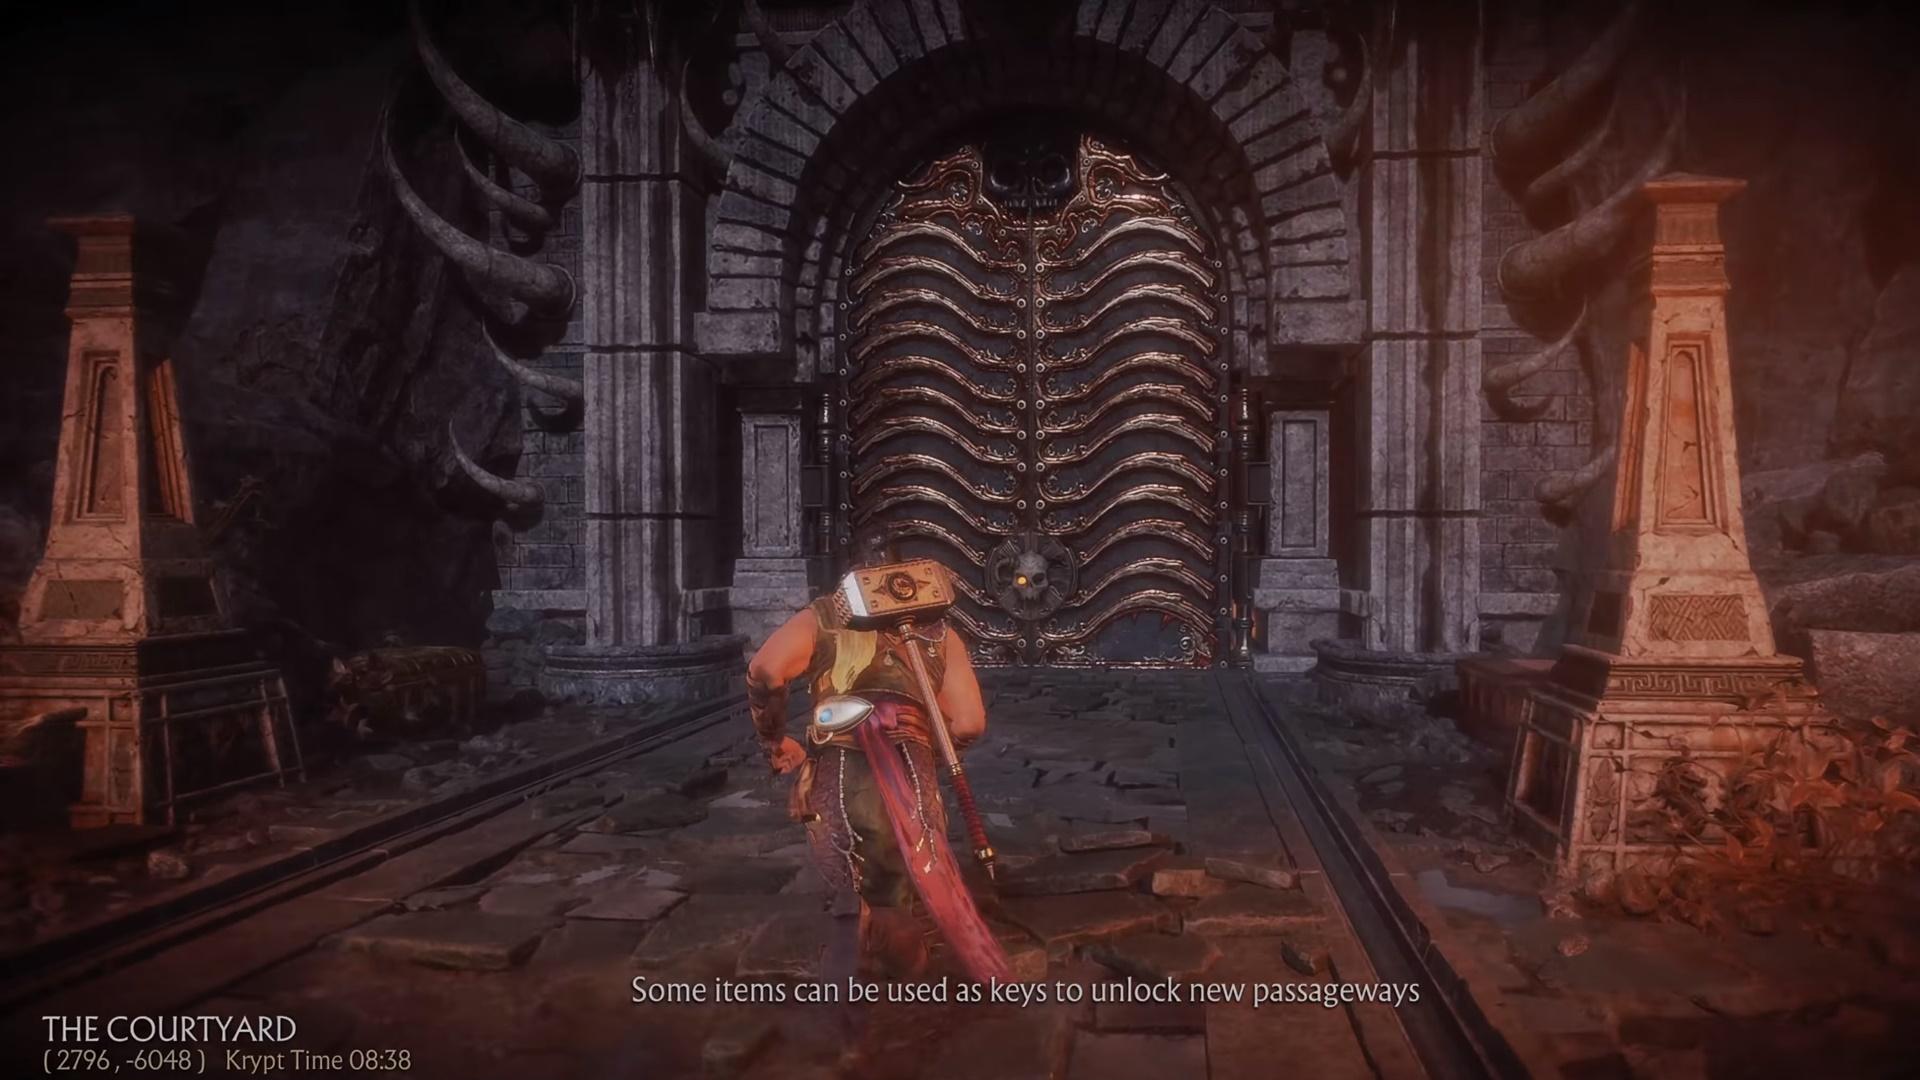 Mortal Kombat 11 Krypt walkthrough: key items, chests, and secret